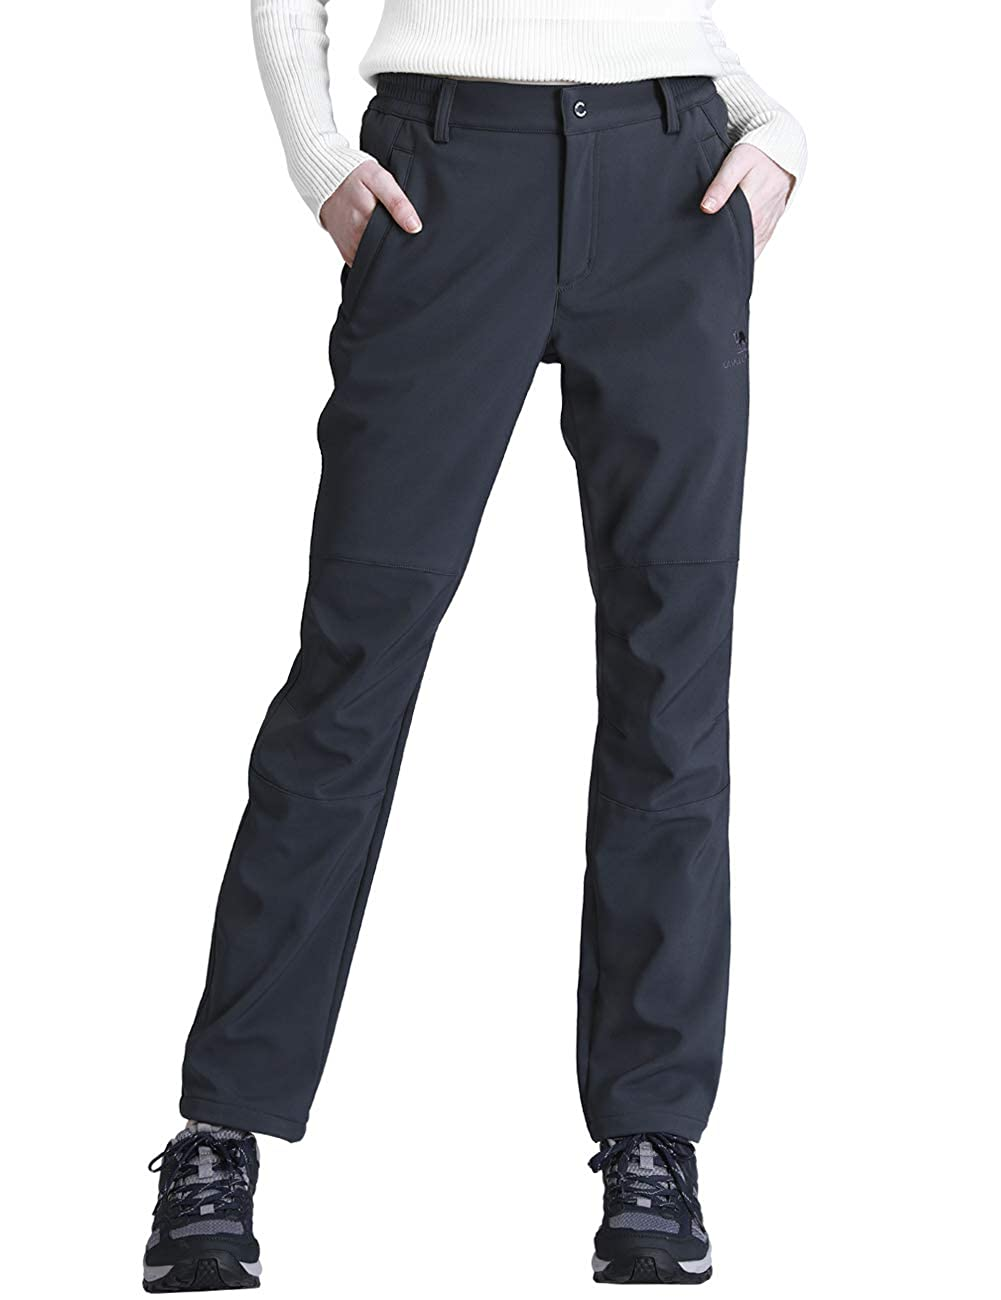 2018 Children Outdoor Ski Climbing Pants Outdoor Waterproof Ski Pants Warm Insulated Windproof Snow Pants Convenience Goods Children Sportswear & Accessories